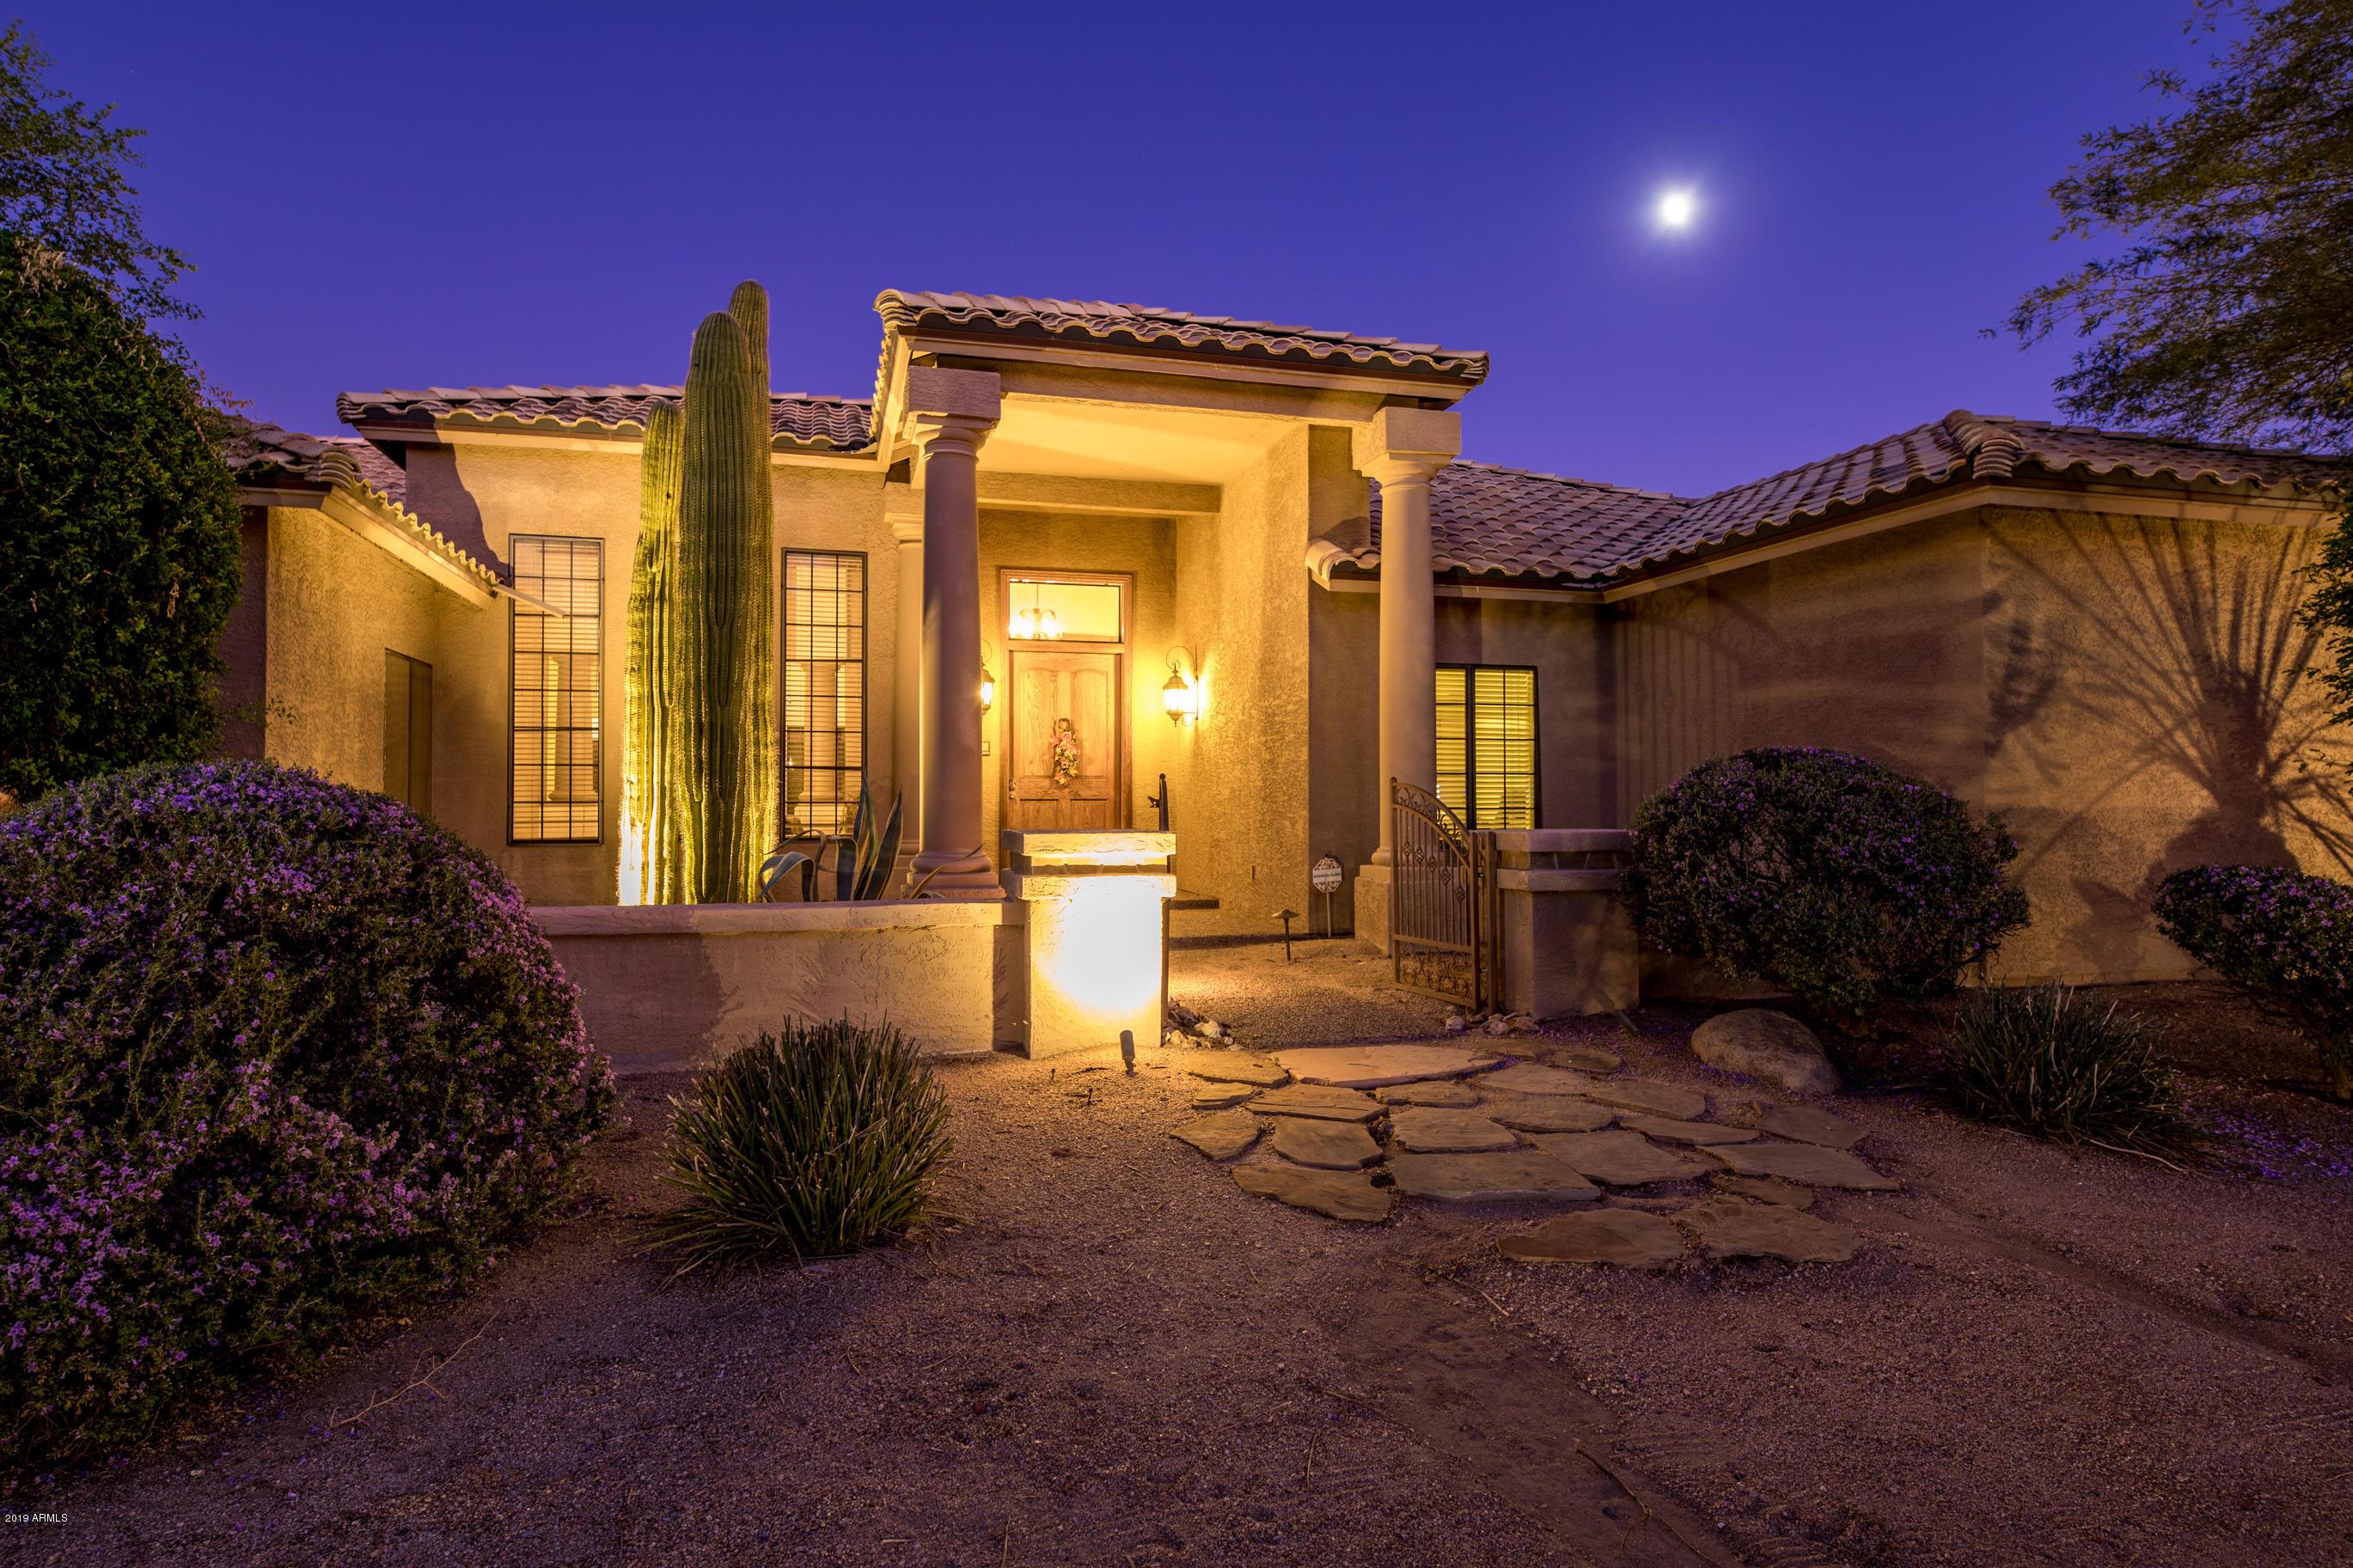 Photo of 8433 E WHISPERING WIND Drive, Scottsdale, AZ 85255